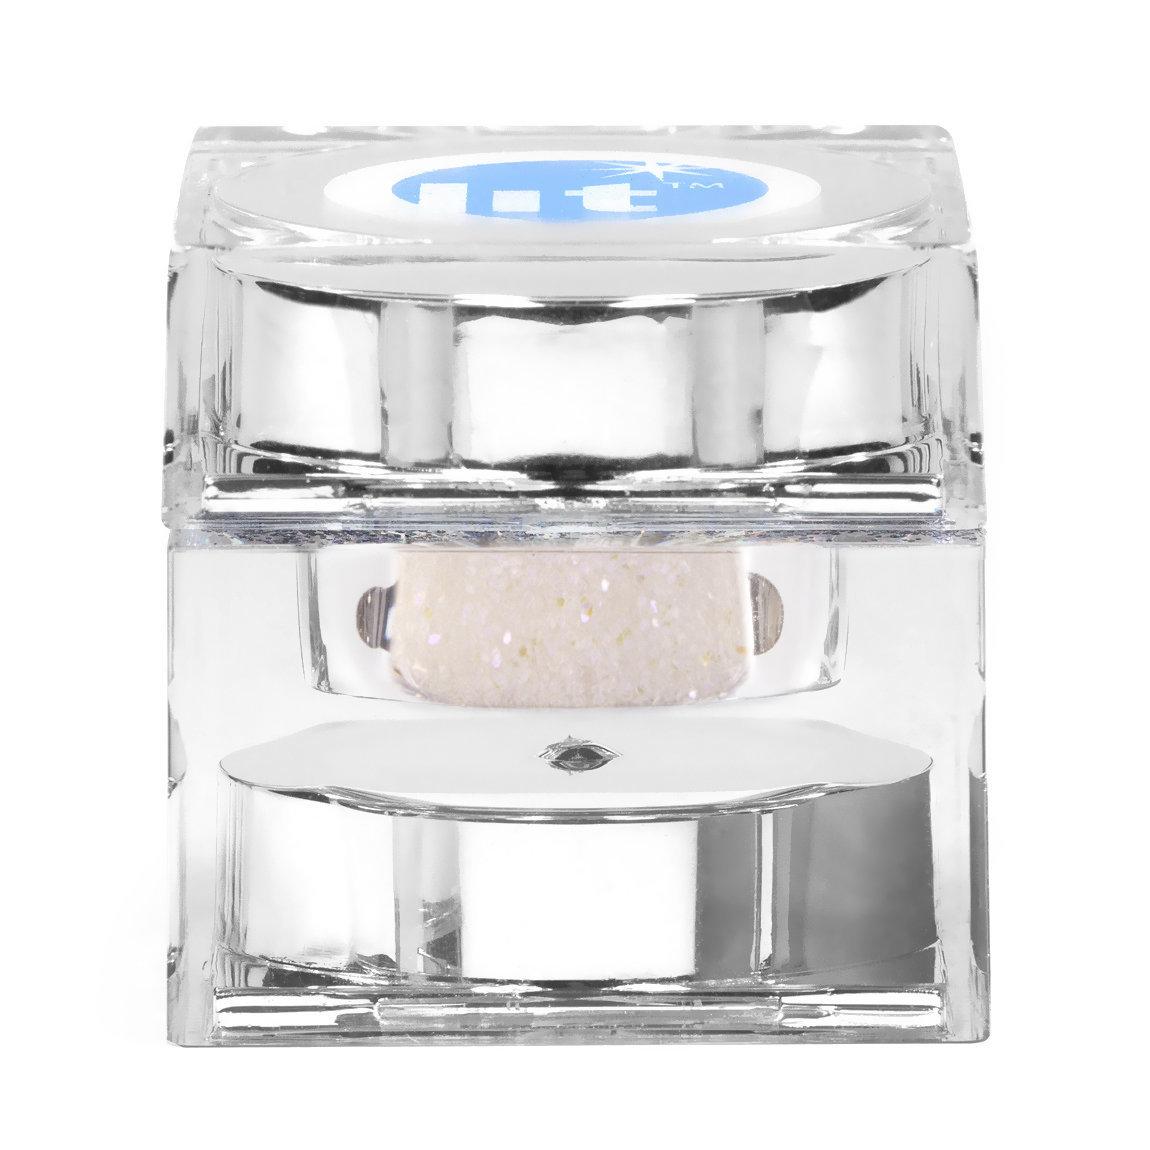 Lit Cosmetics Lit Glitter Northern Lights S3 (Shimmer) alternative view 1.